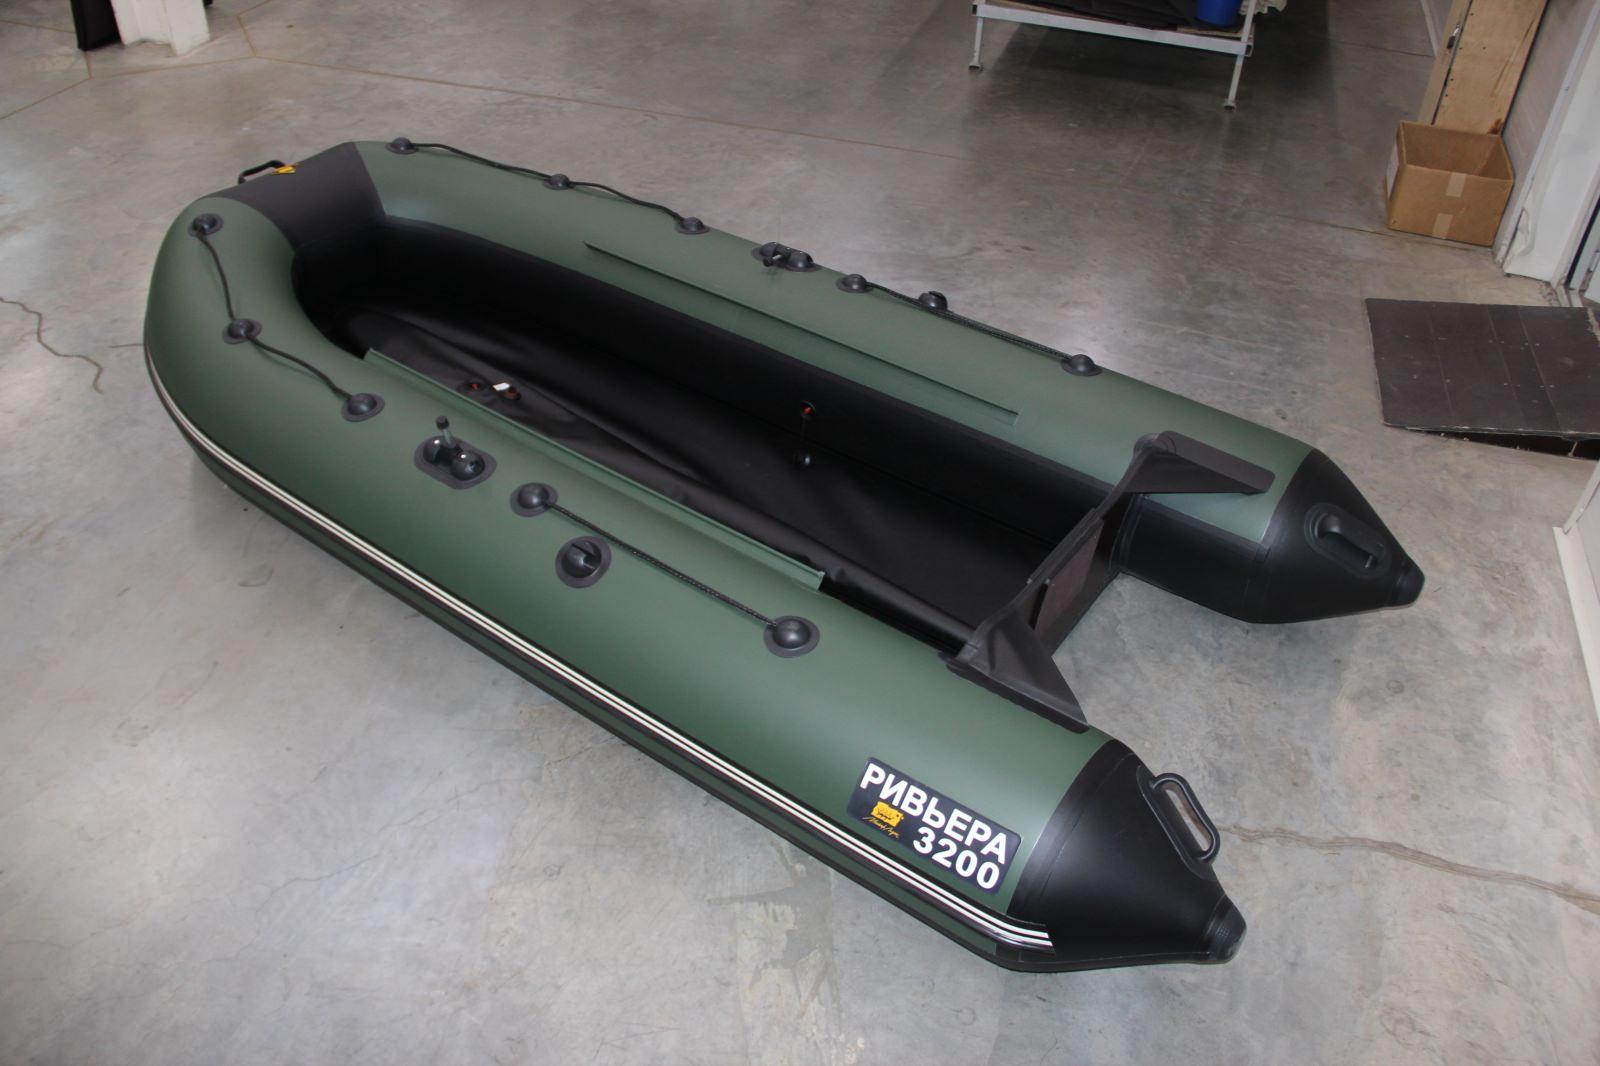 лодка пвх ривьера 3200 ск цена в казани